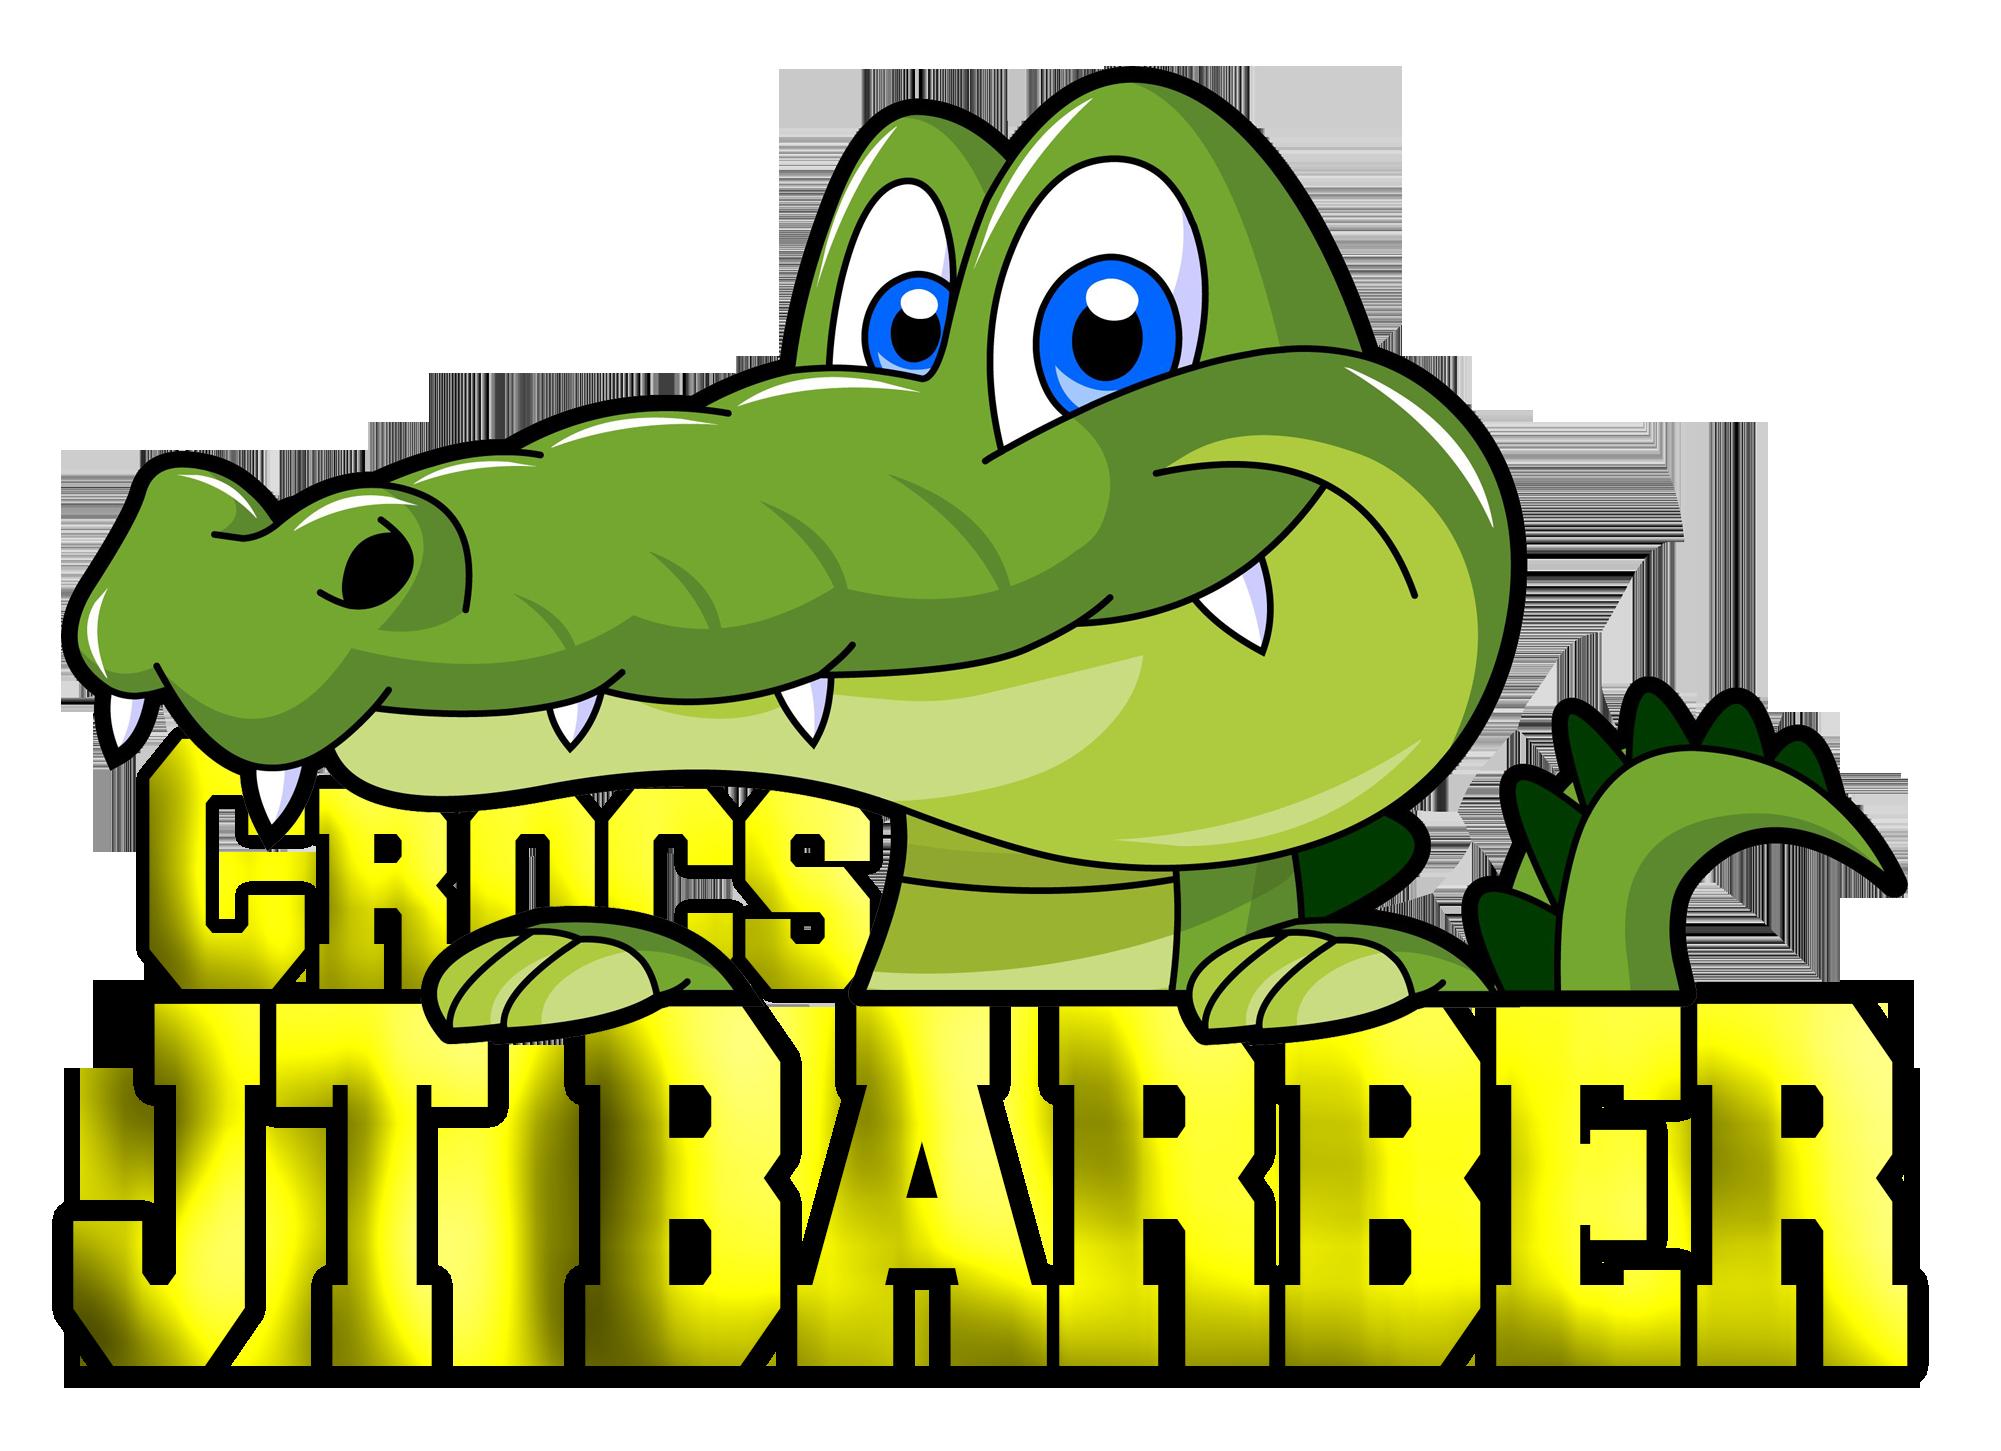 J T  Barber Elementary / Homepage